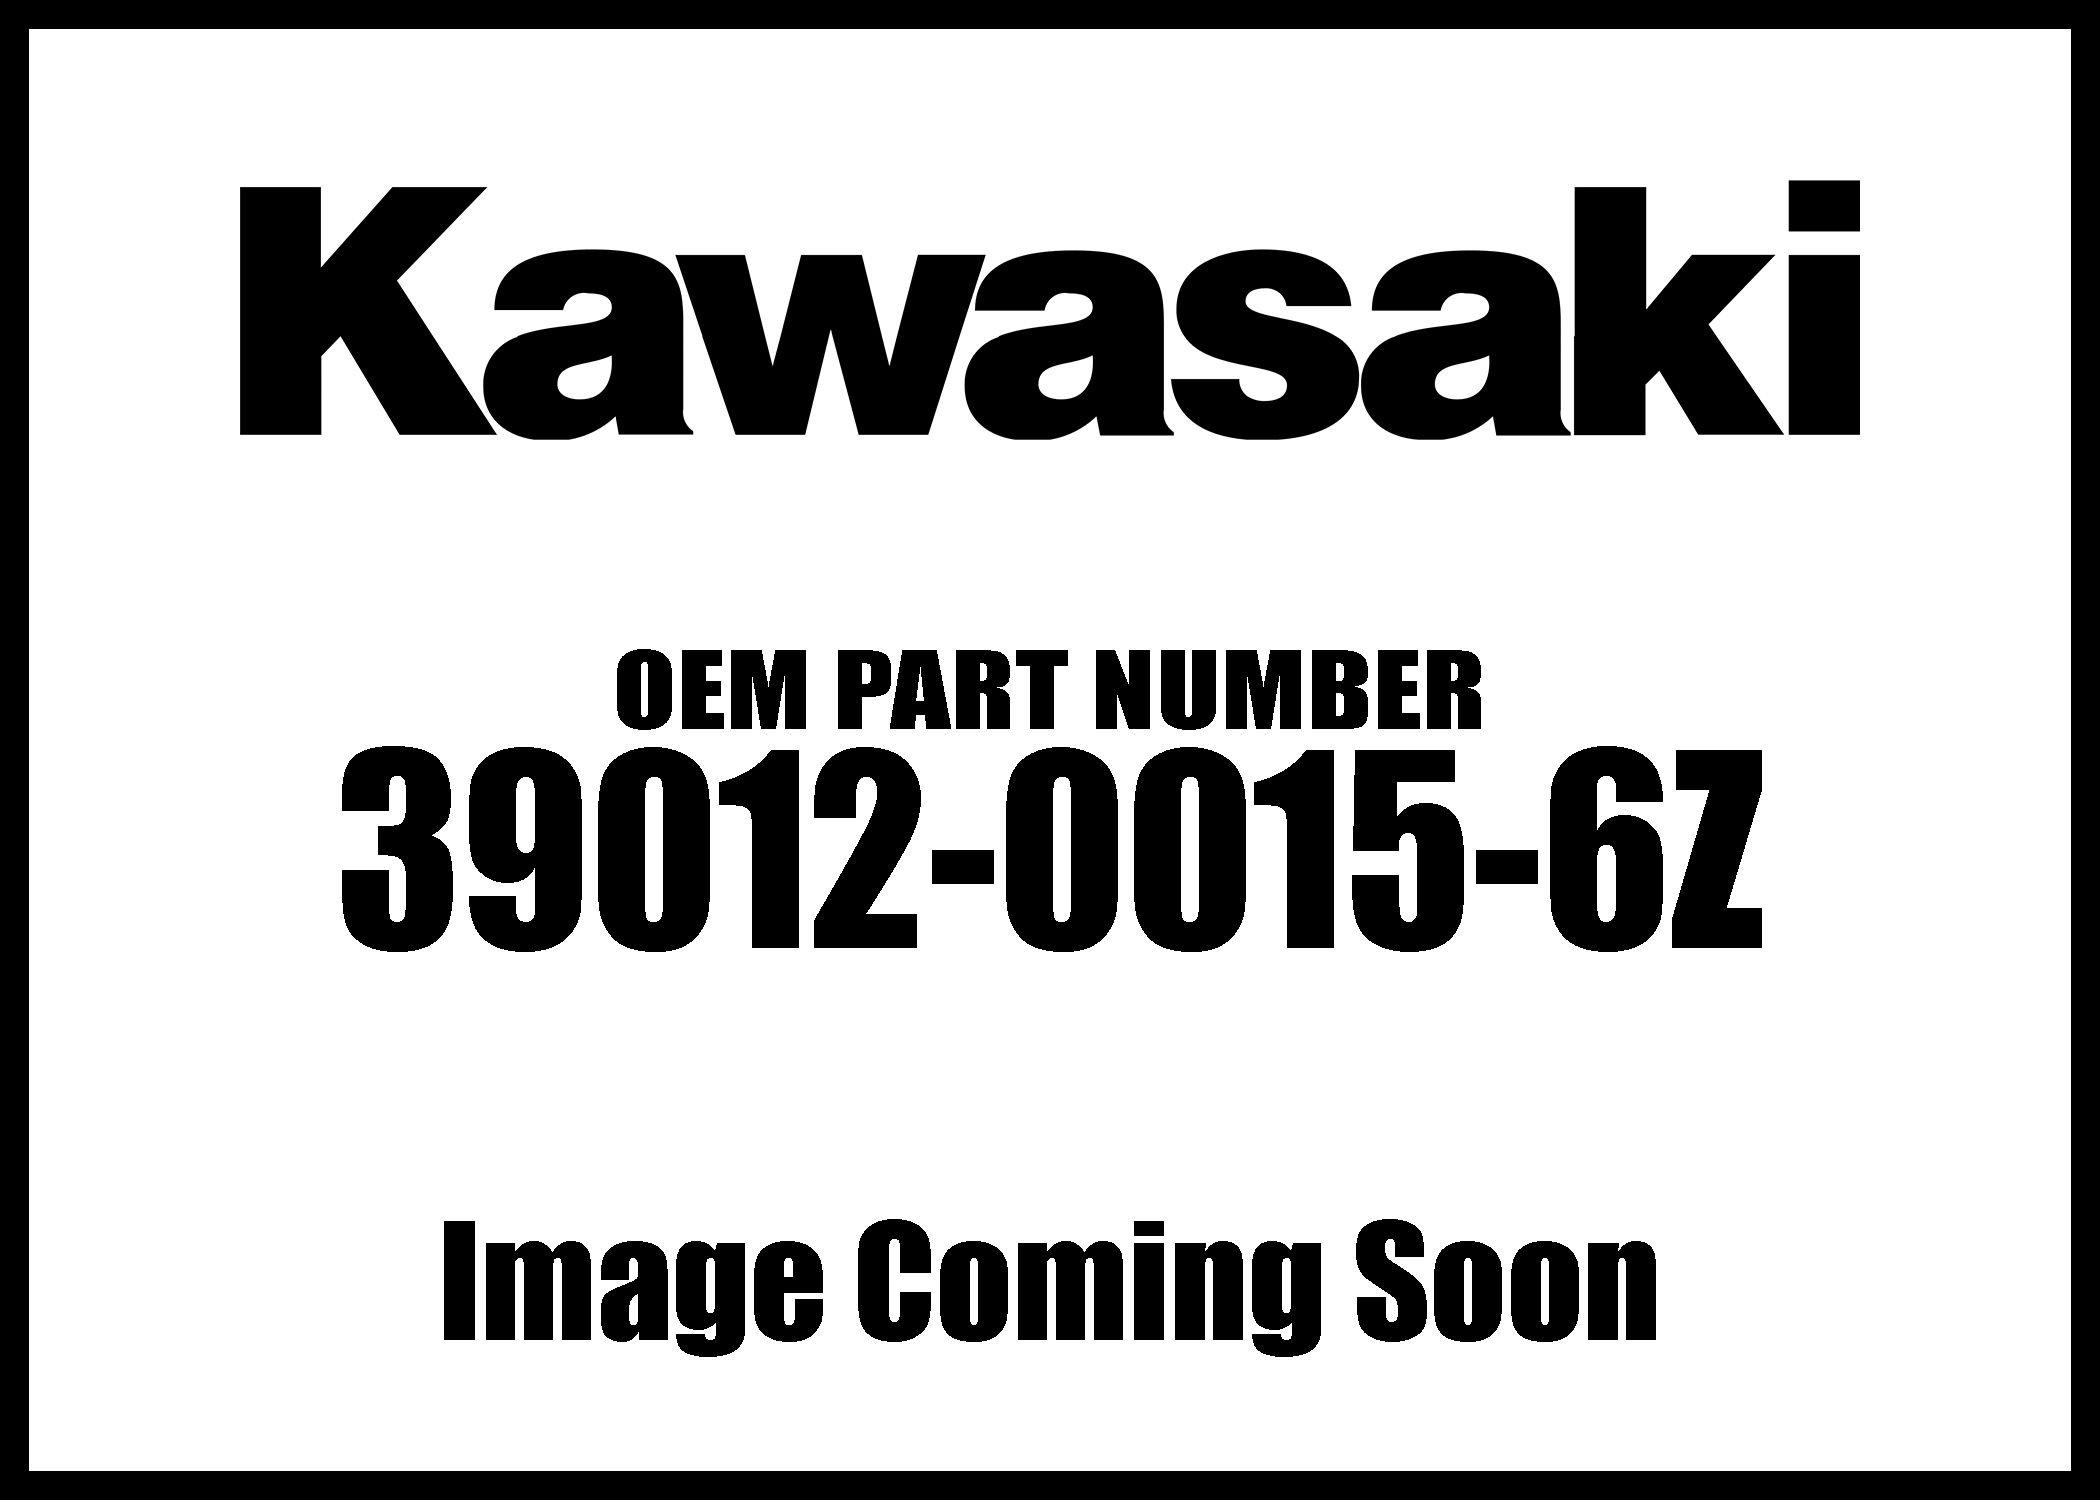 Kawasaki 08-18 Brute Force Case Storage F.Black 39012-0015-6Z New Oem by Kawasaki